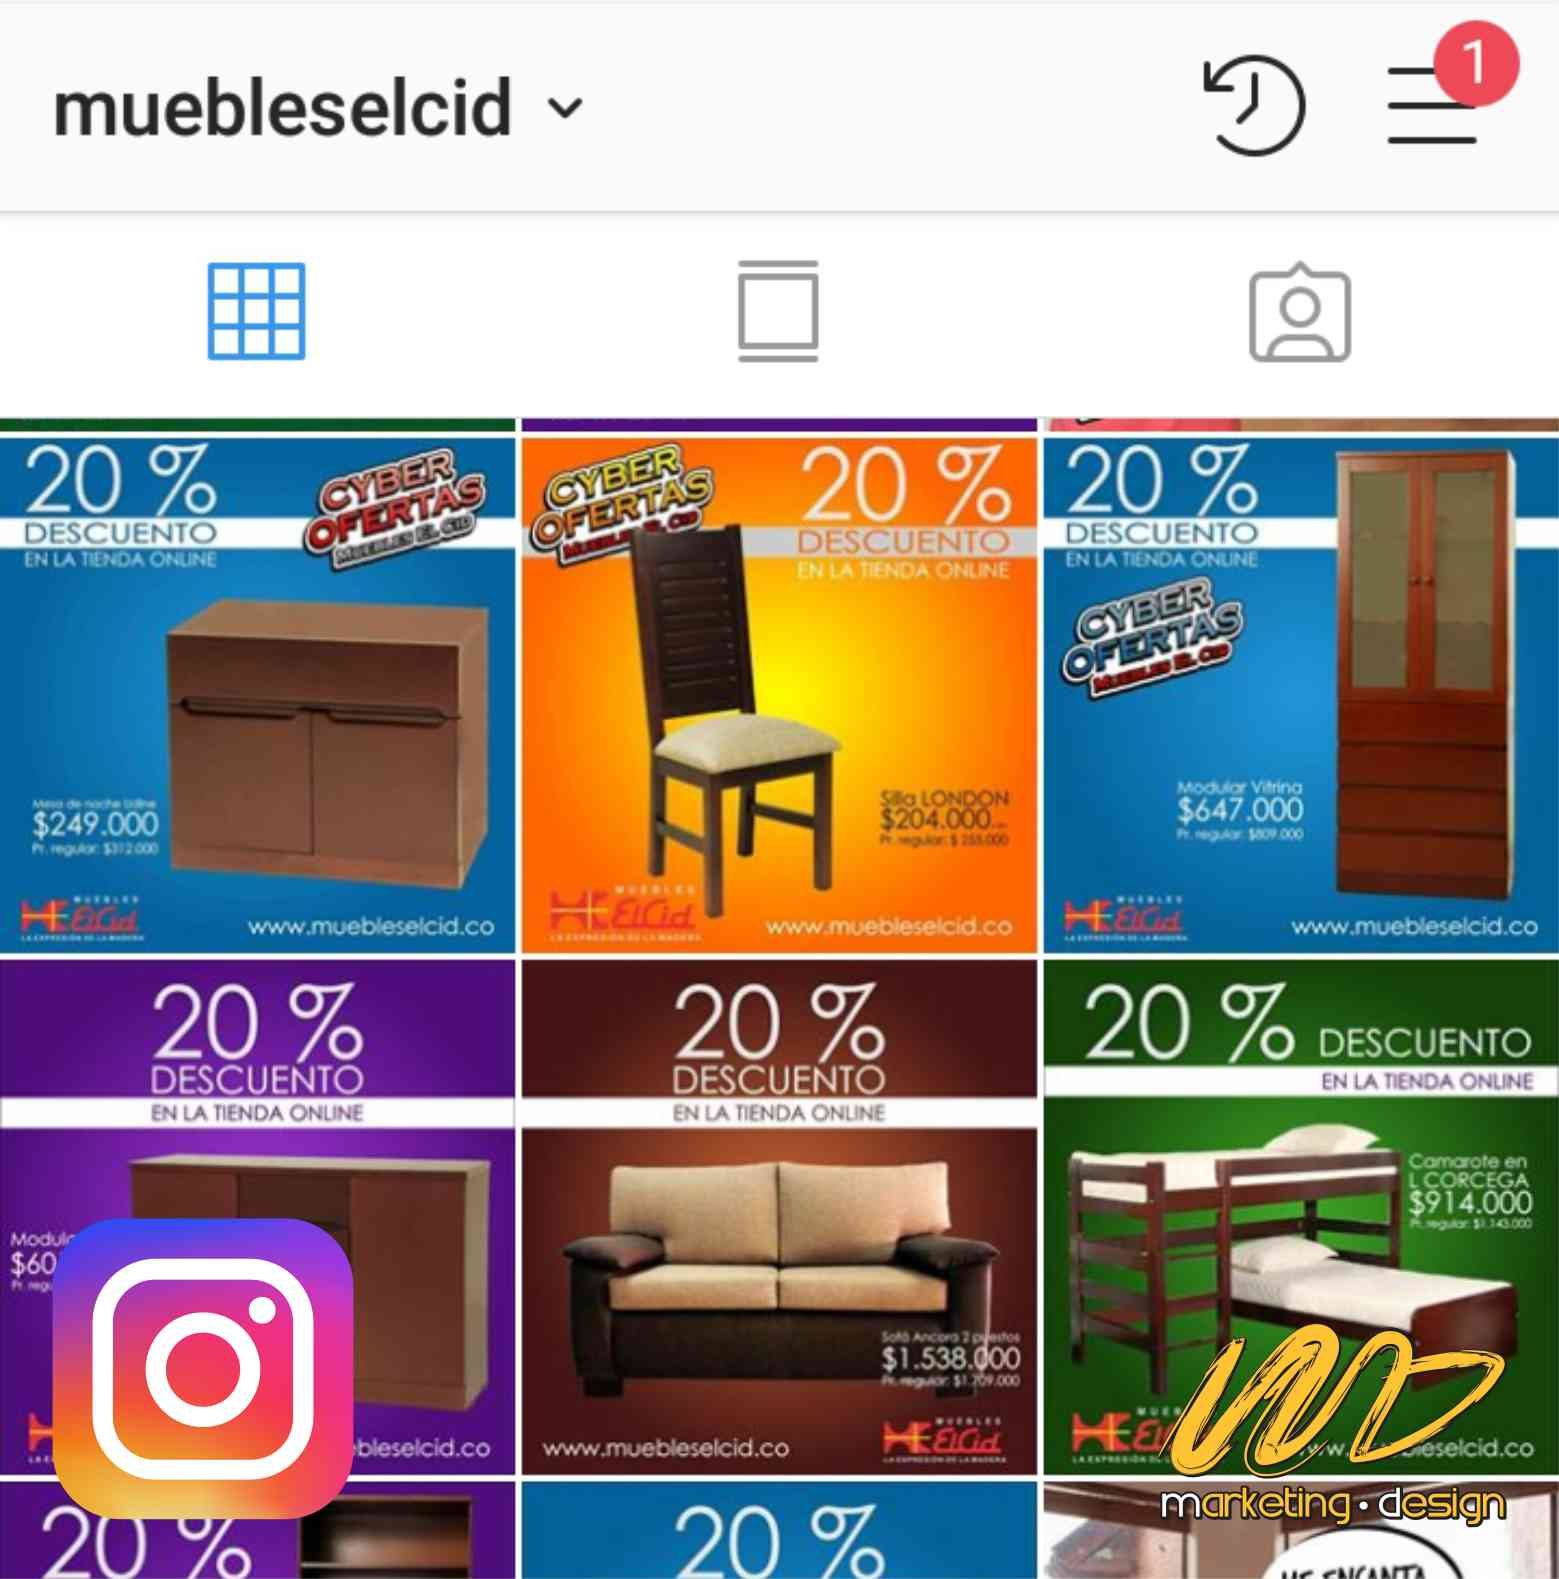 Clientes Instagram Marketing Design 1902